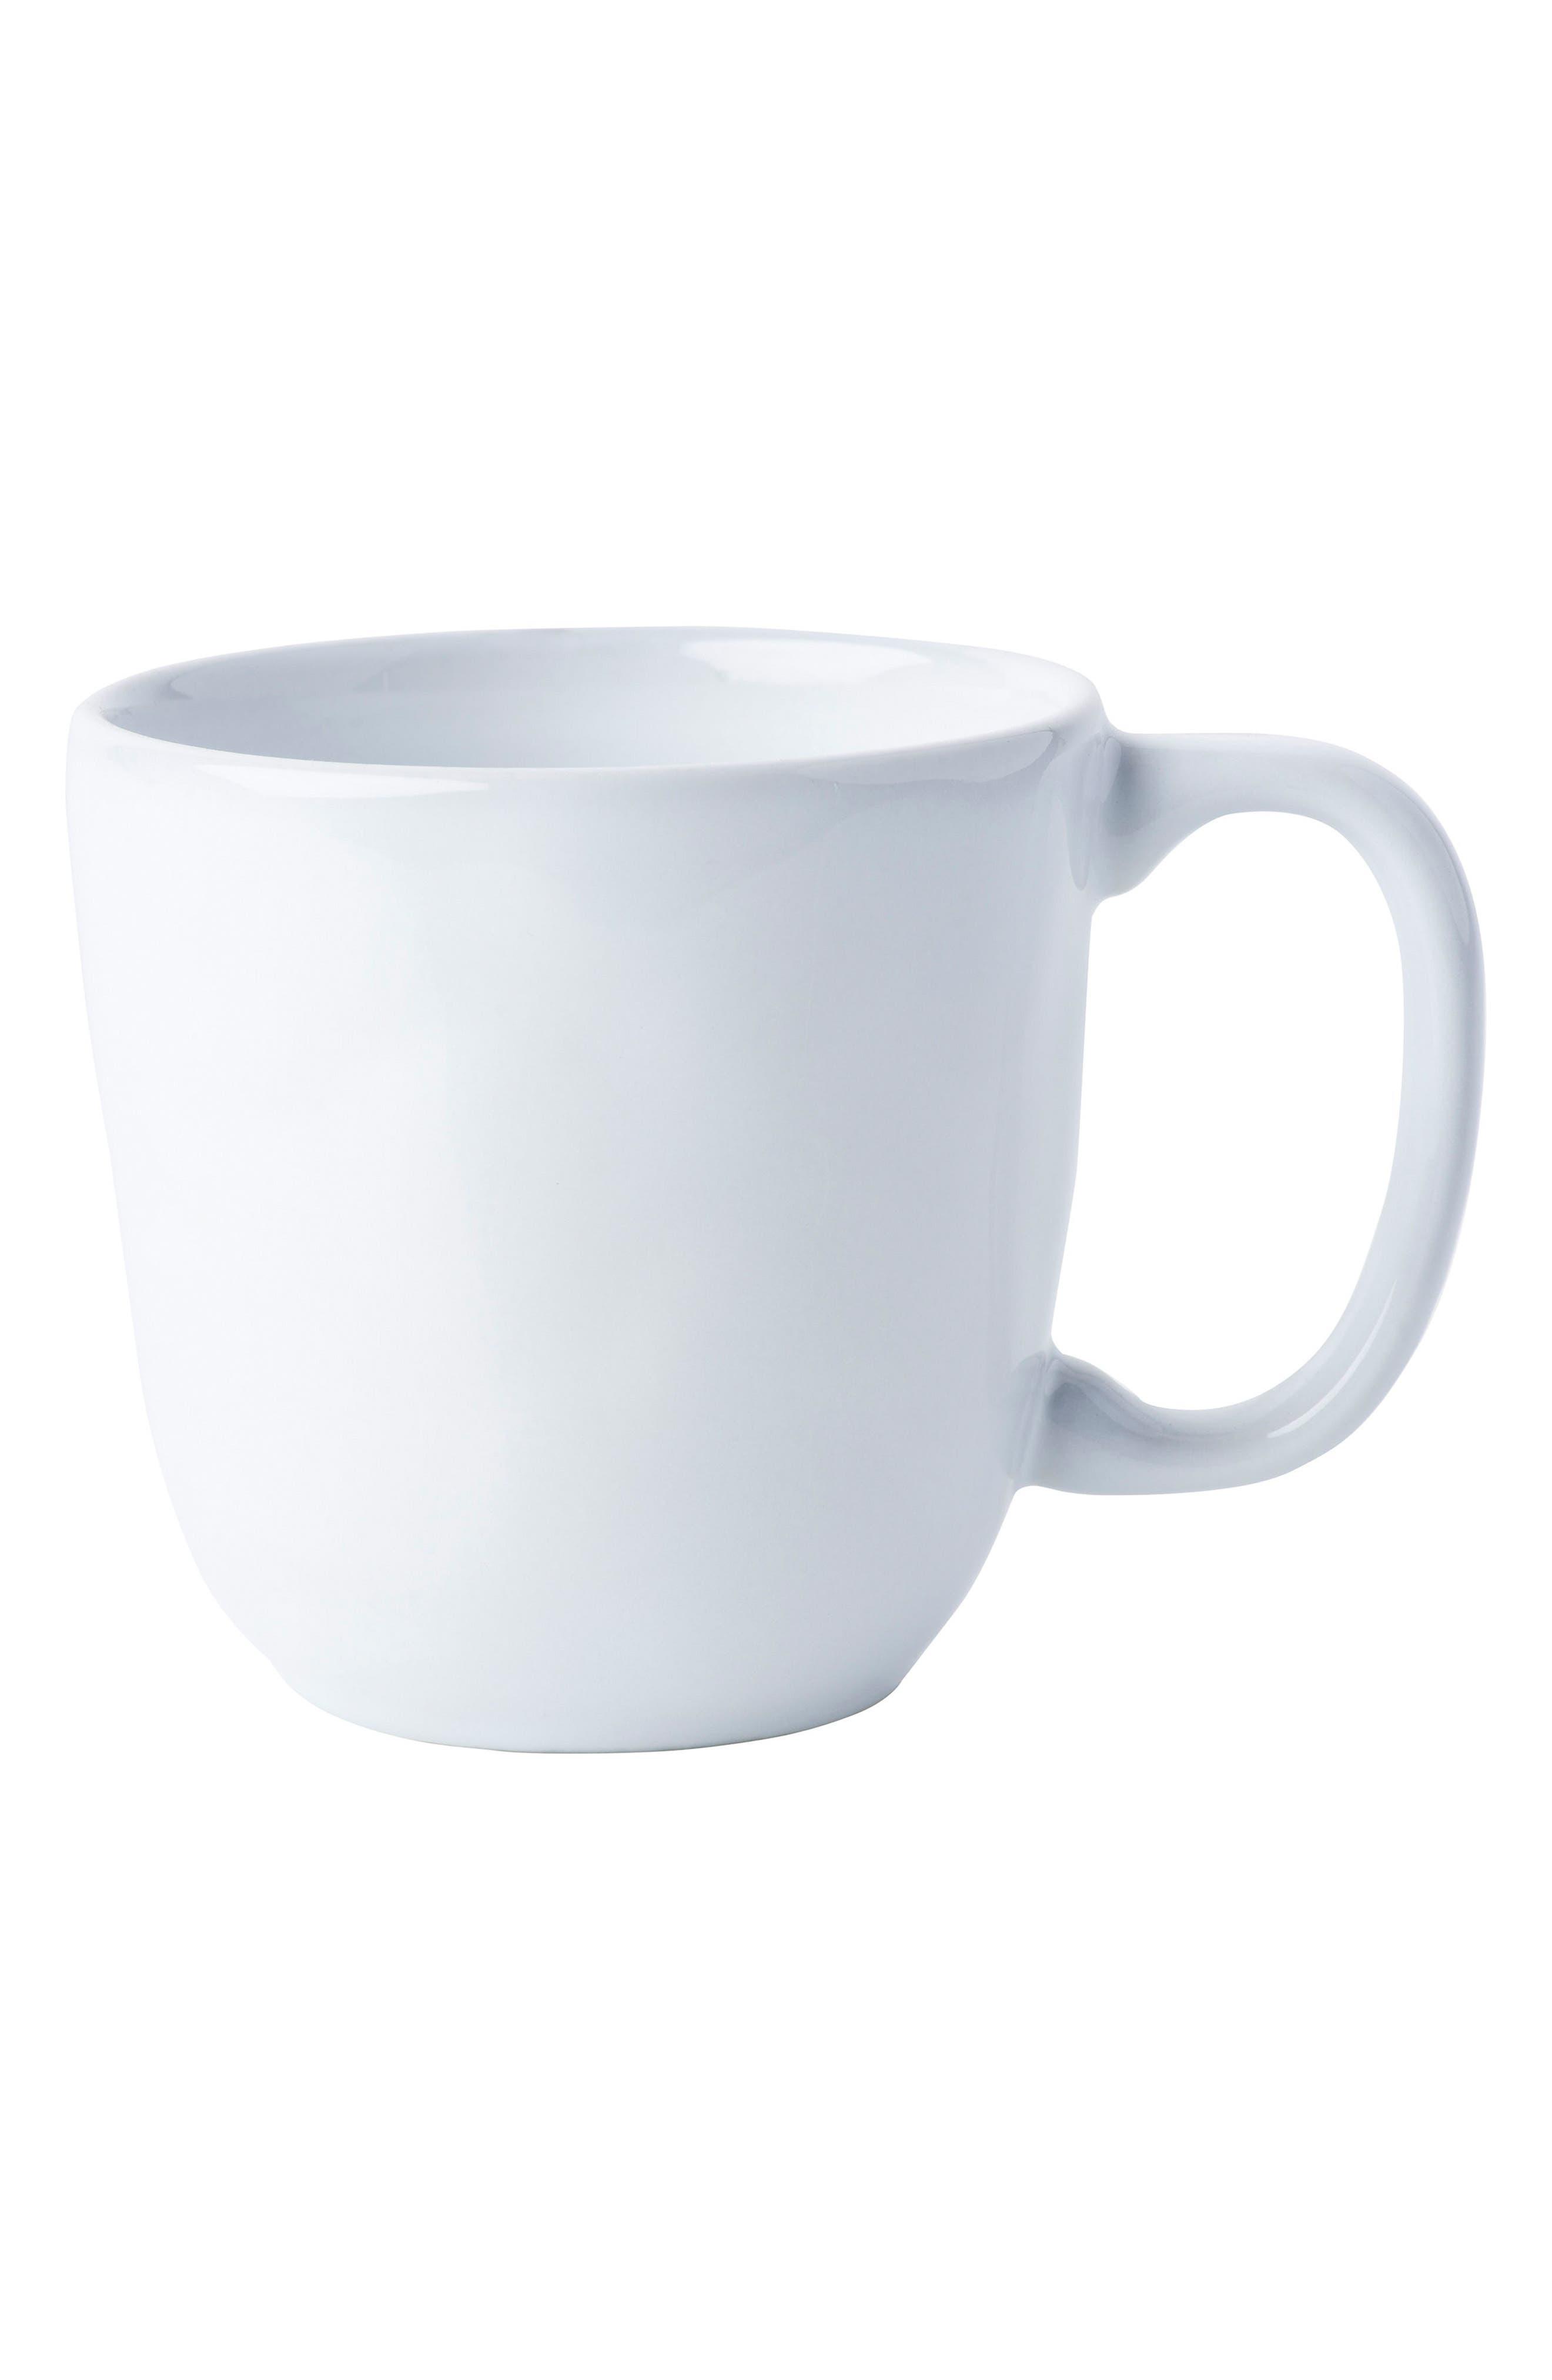 Juliska Quotidien White Truffle Ceramic Mug